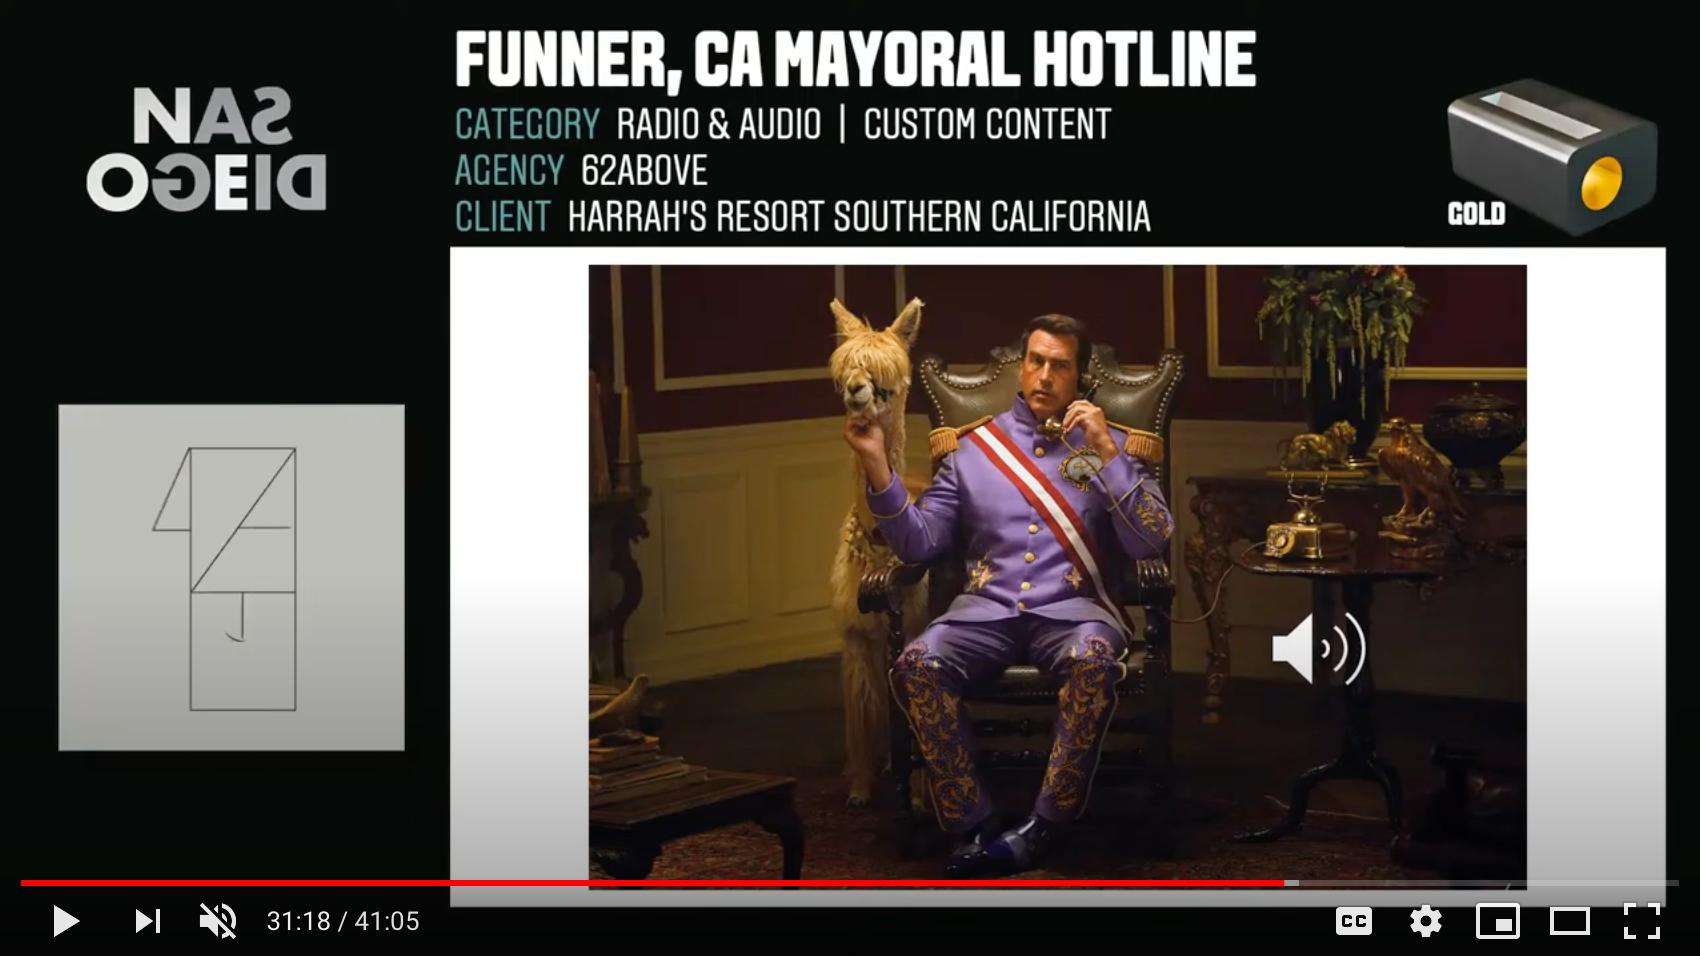 Funner_Gold_Mayoral-Hotline_Radio_Audio_Custom-Content.png